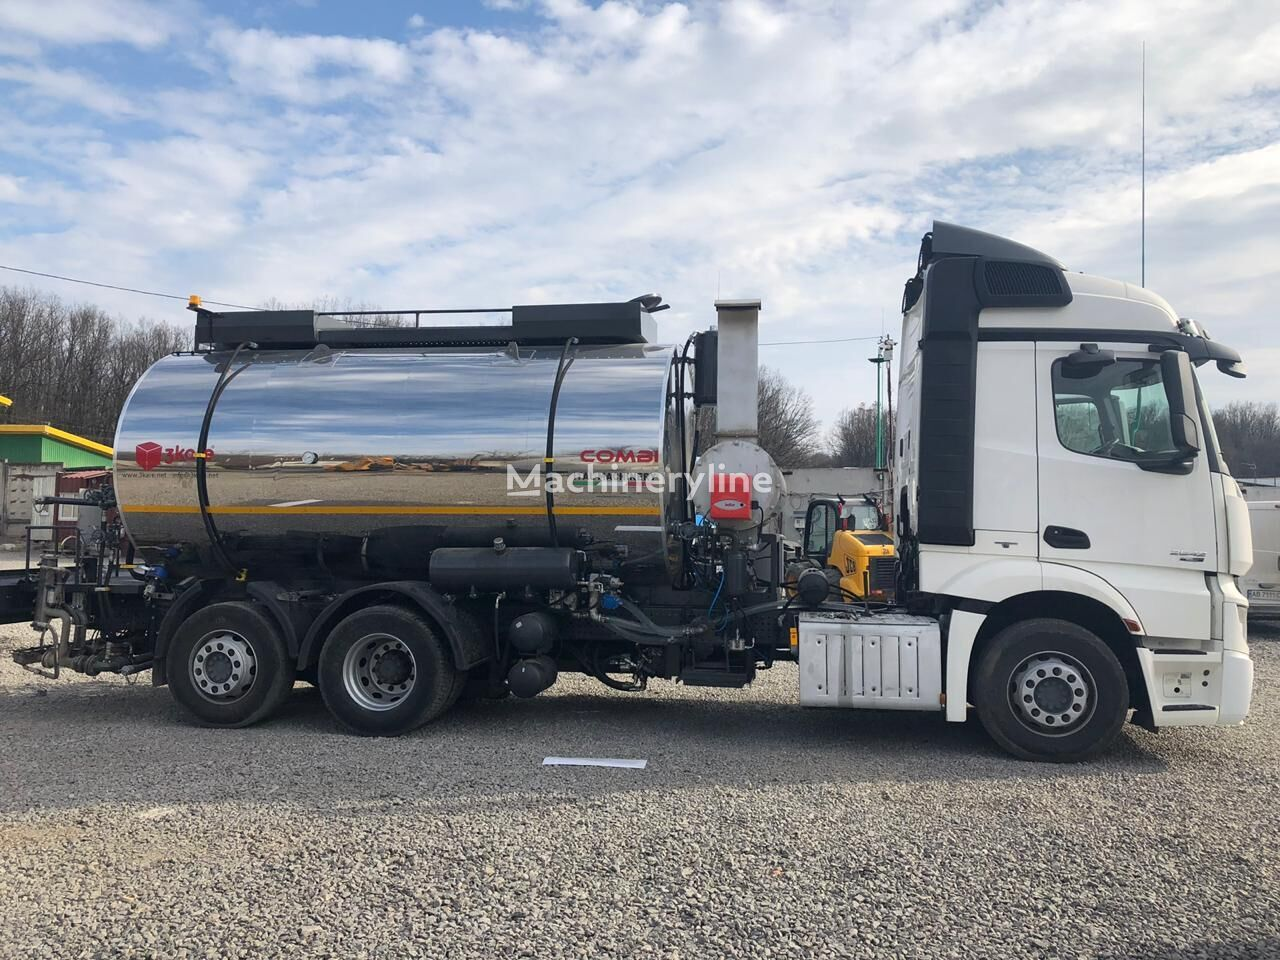 new 3Kare Kombi Asfalt Makinası asphalt distributor